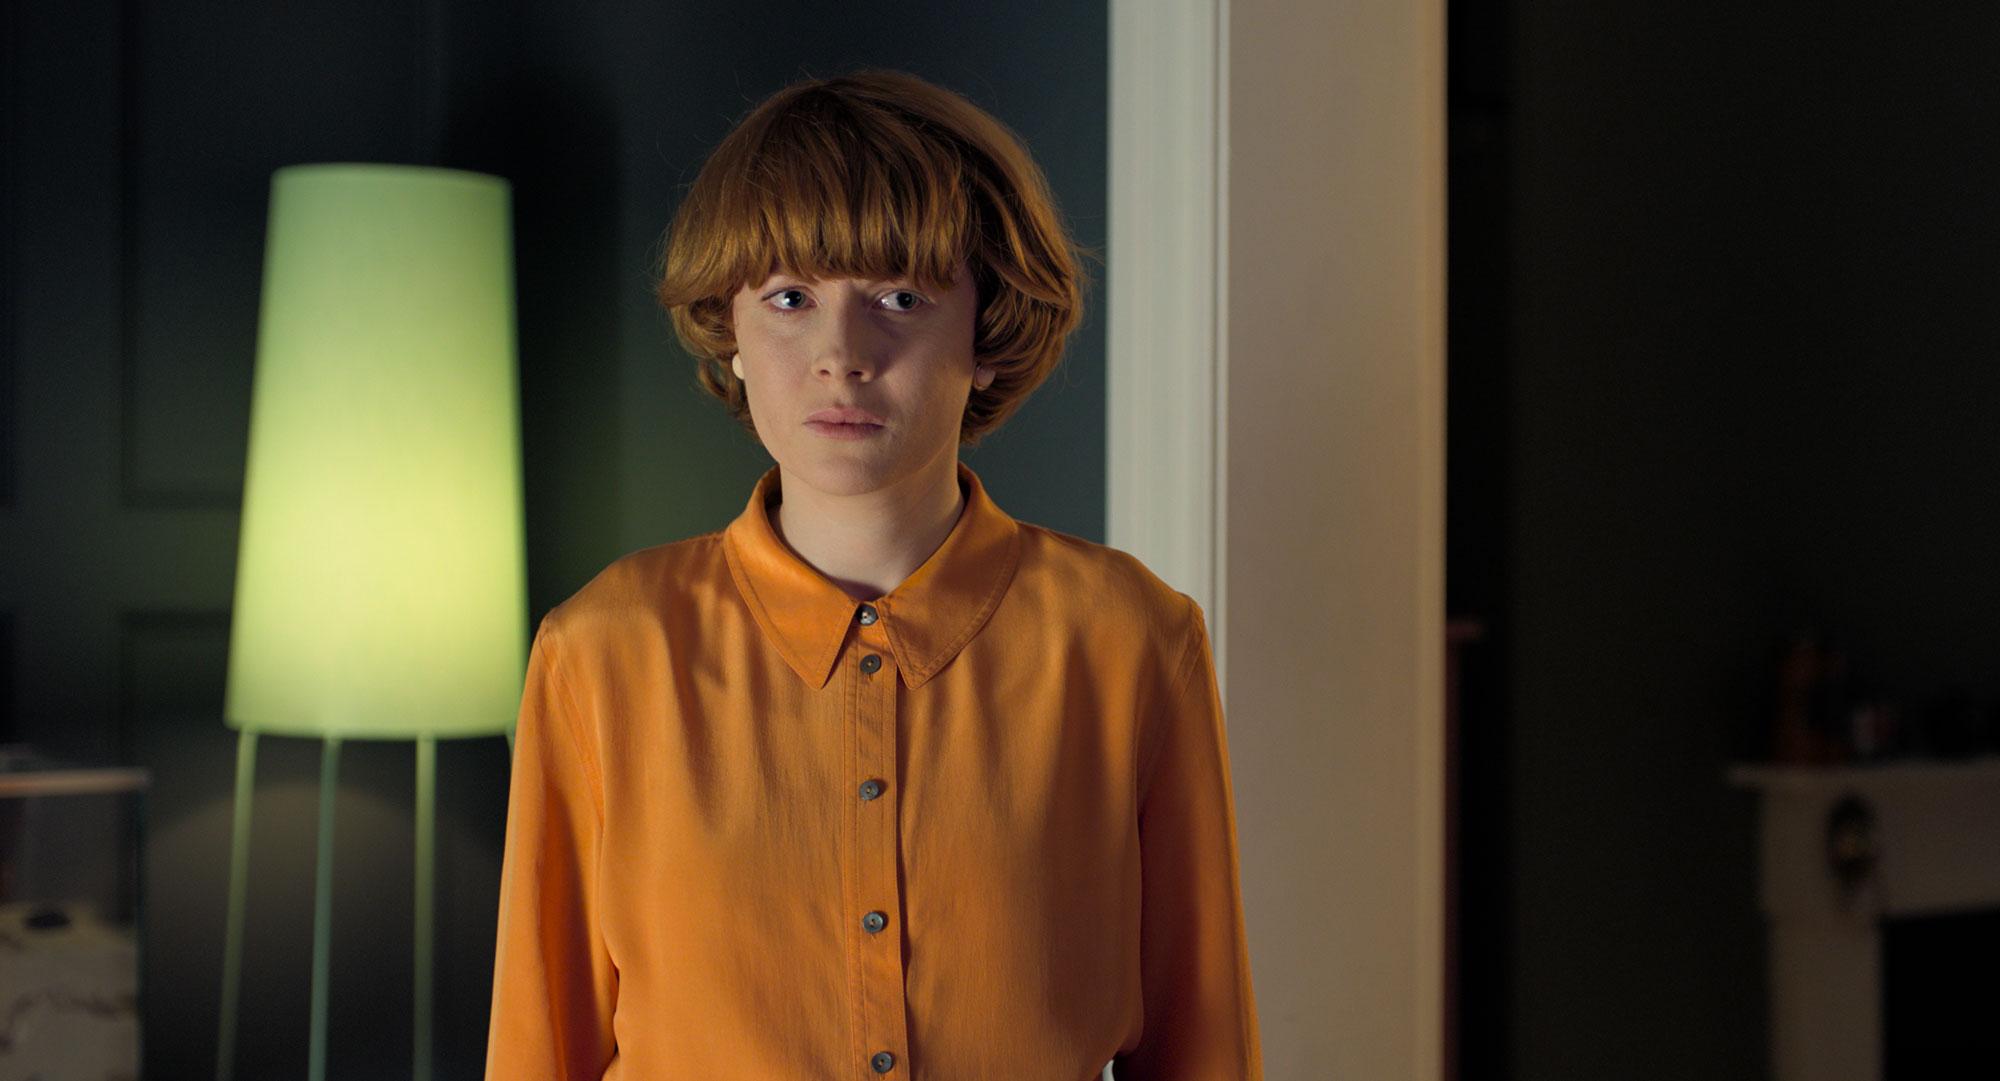 Emily Beacham dans Little Joe de Jessica Hausner